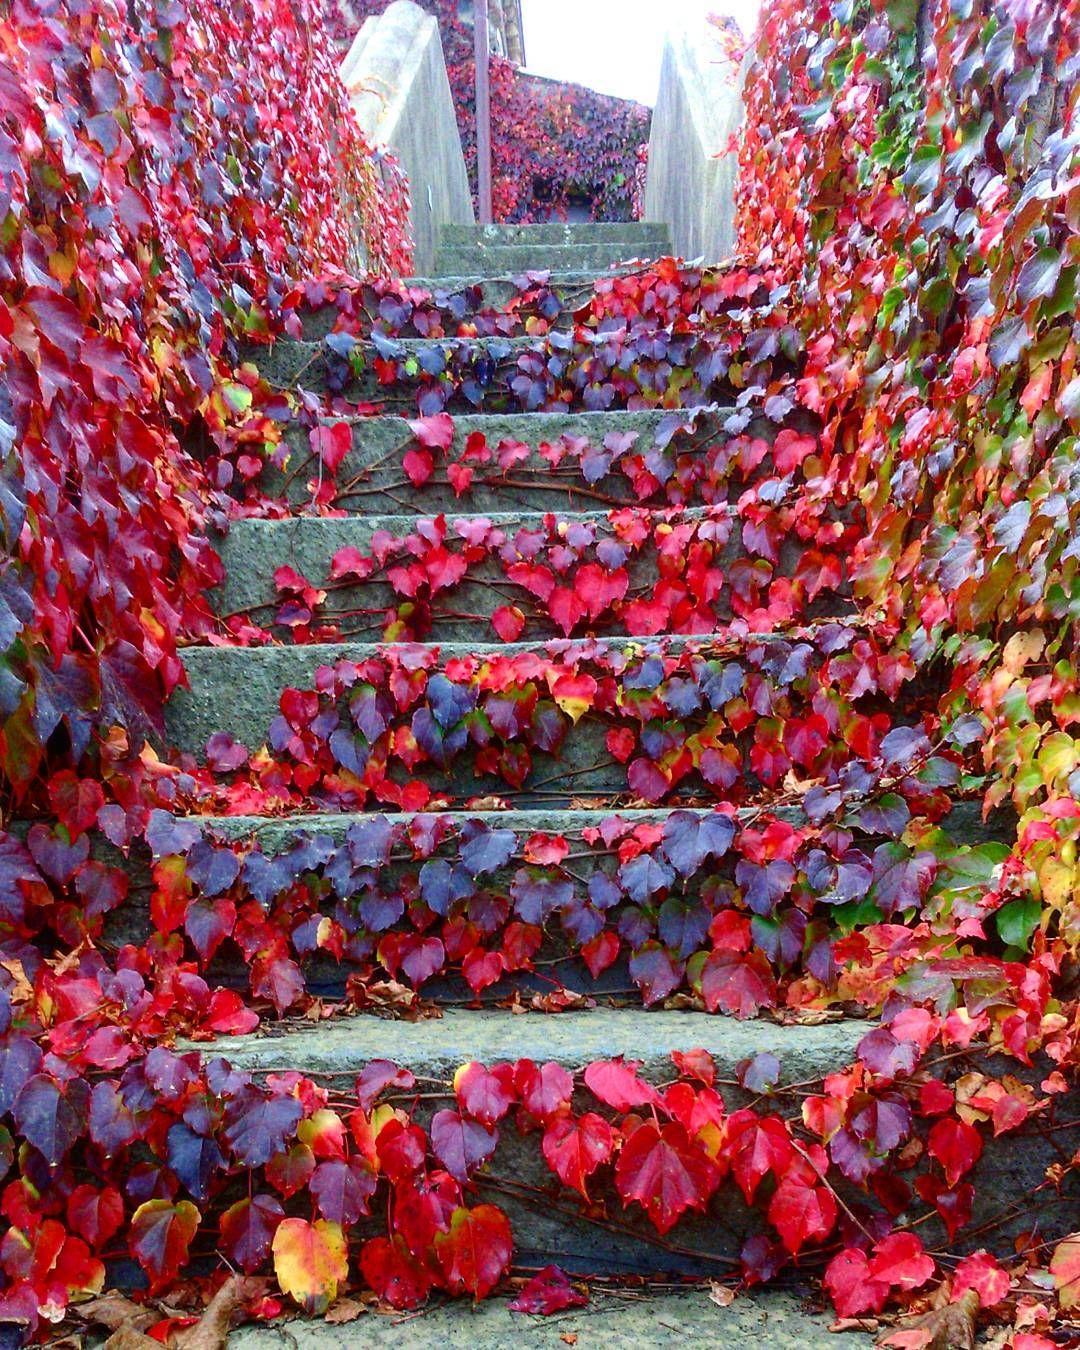 Red Carpet Sicily Autumn Tour Moscamentoestate Naturaldesign Relax Lifestyle Etna Wine Winter Drinking Etn Nature Design Instagram Posts Instagram